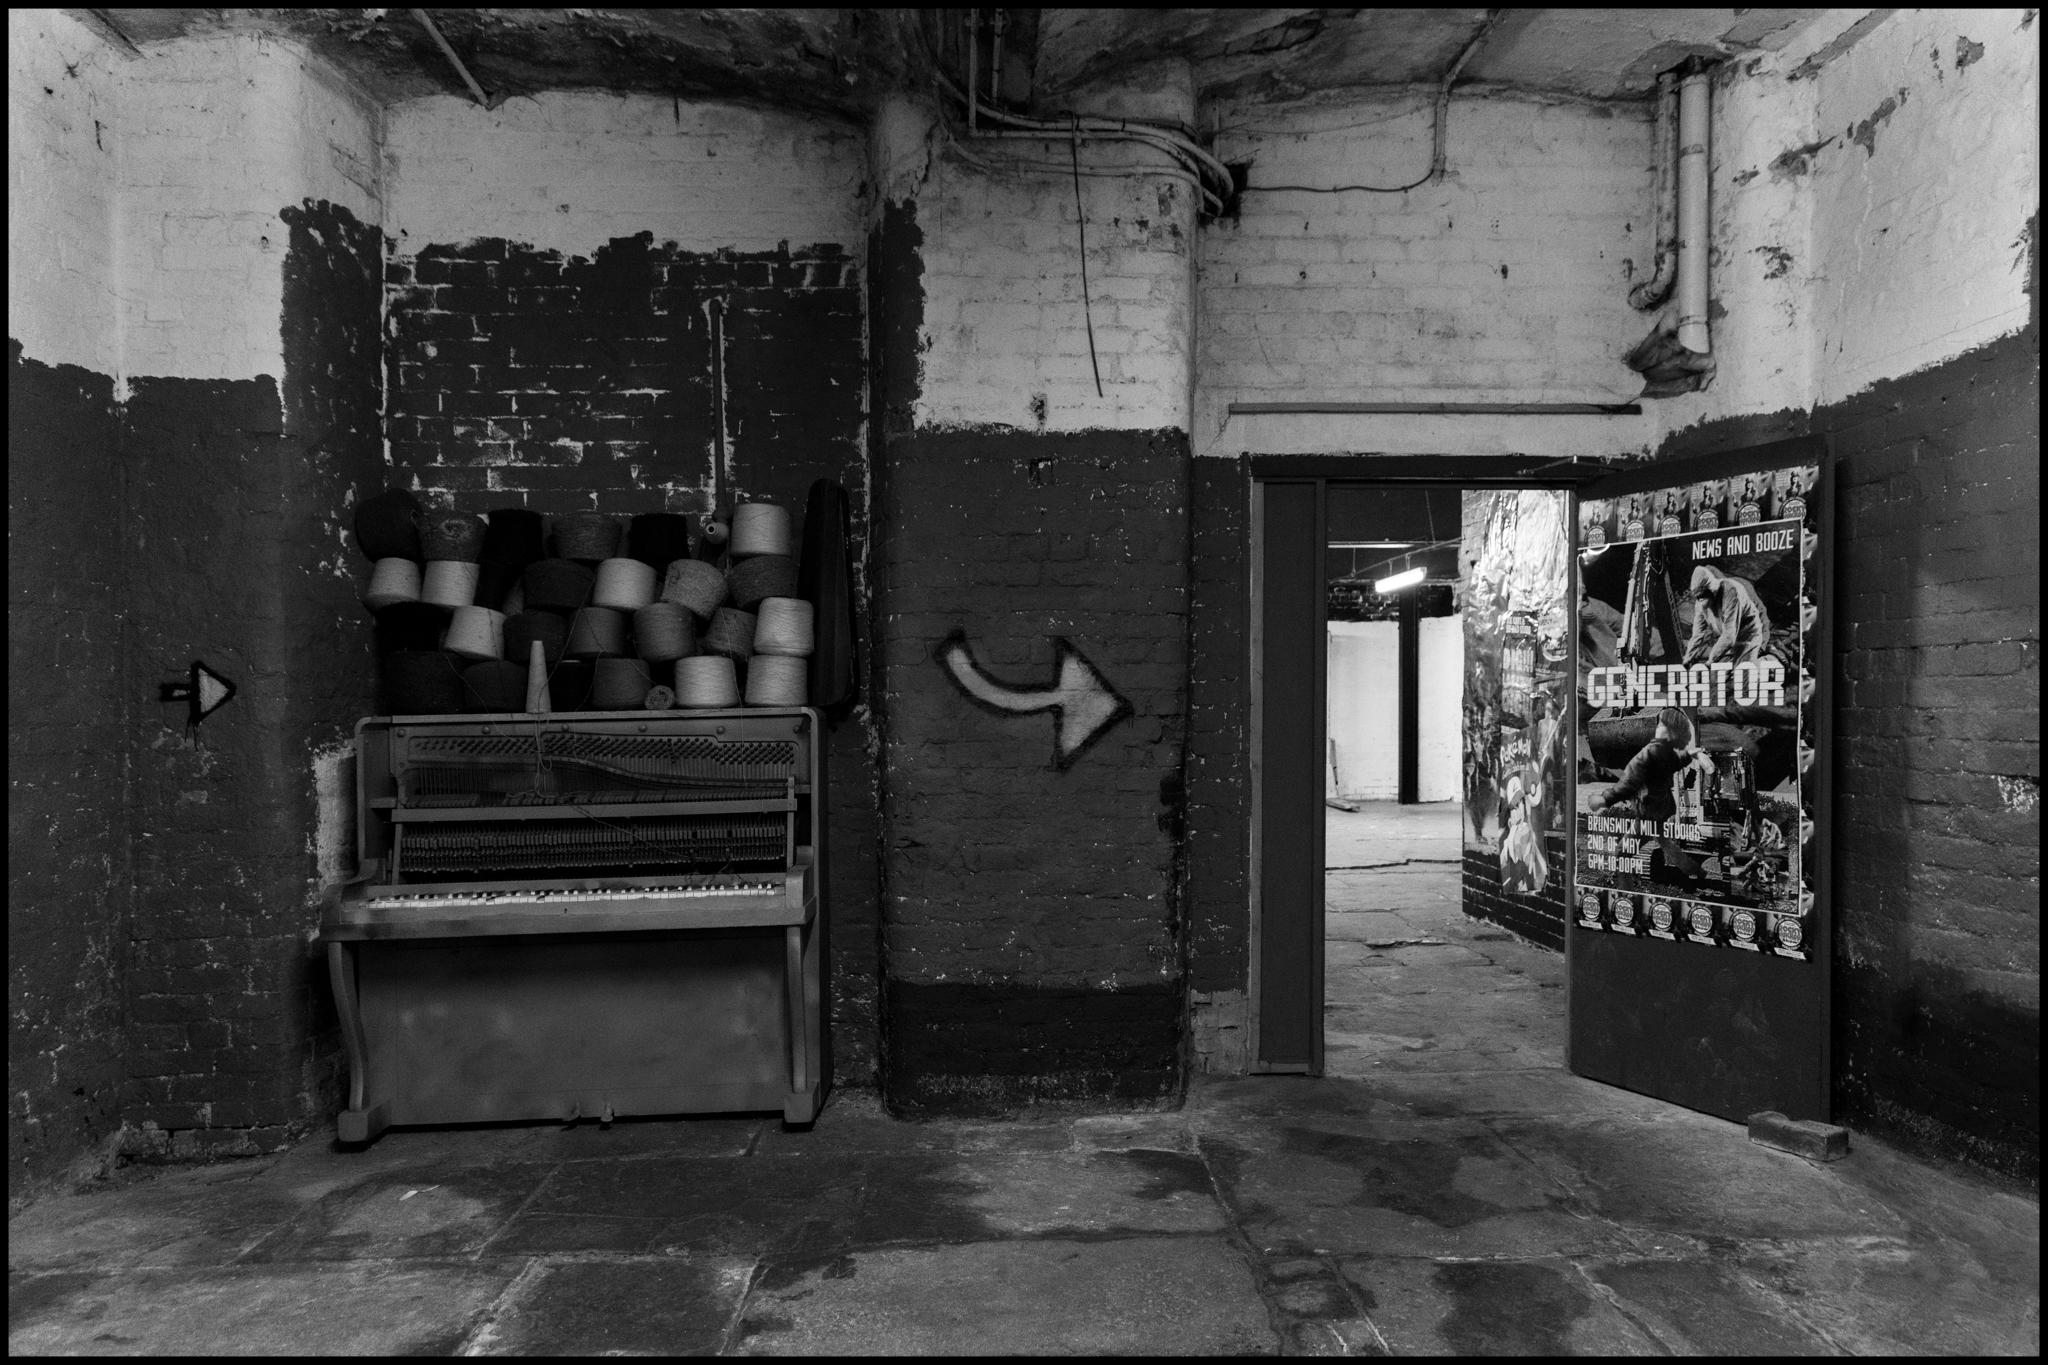 14 May 2019 - Piano & door, Manchester UK